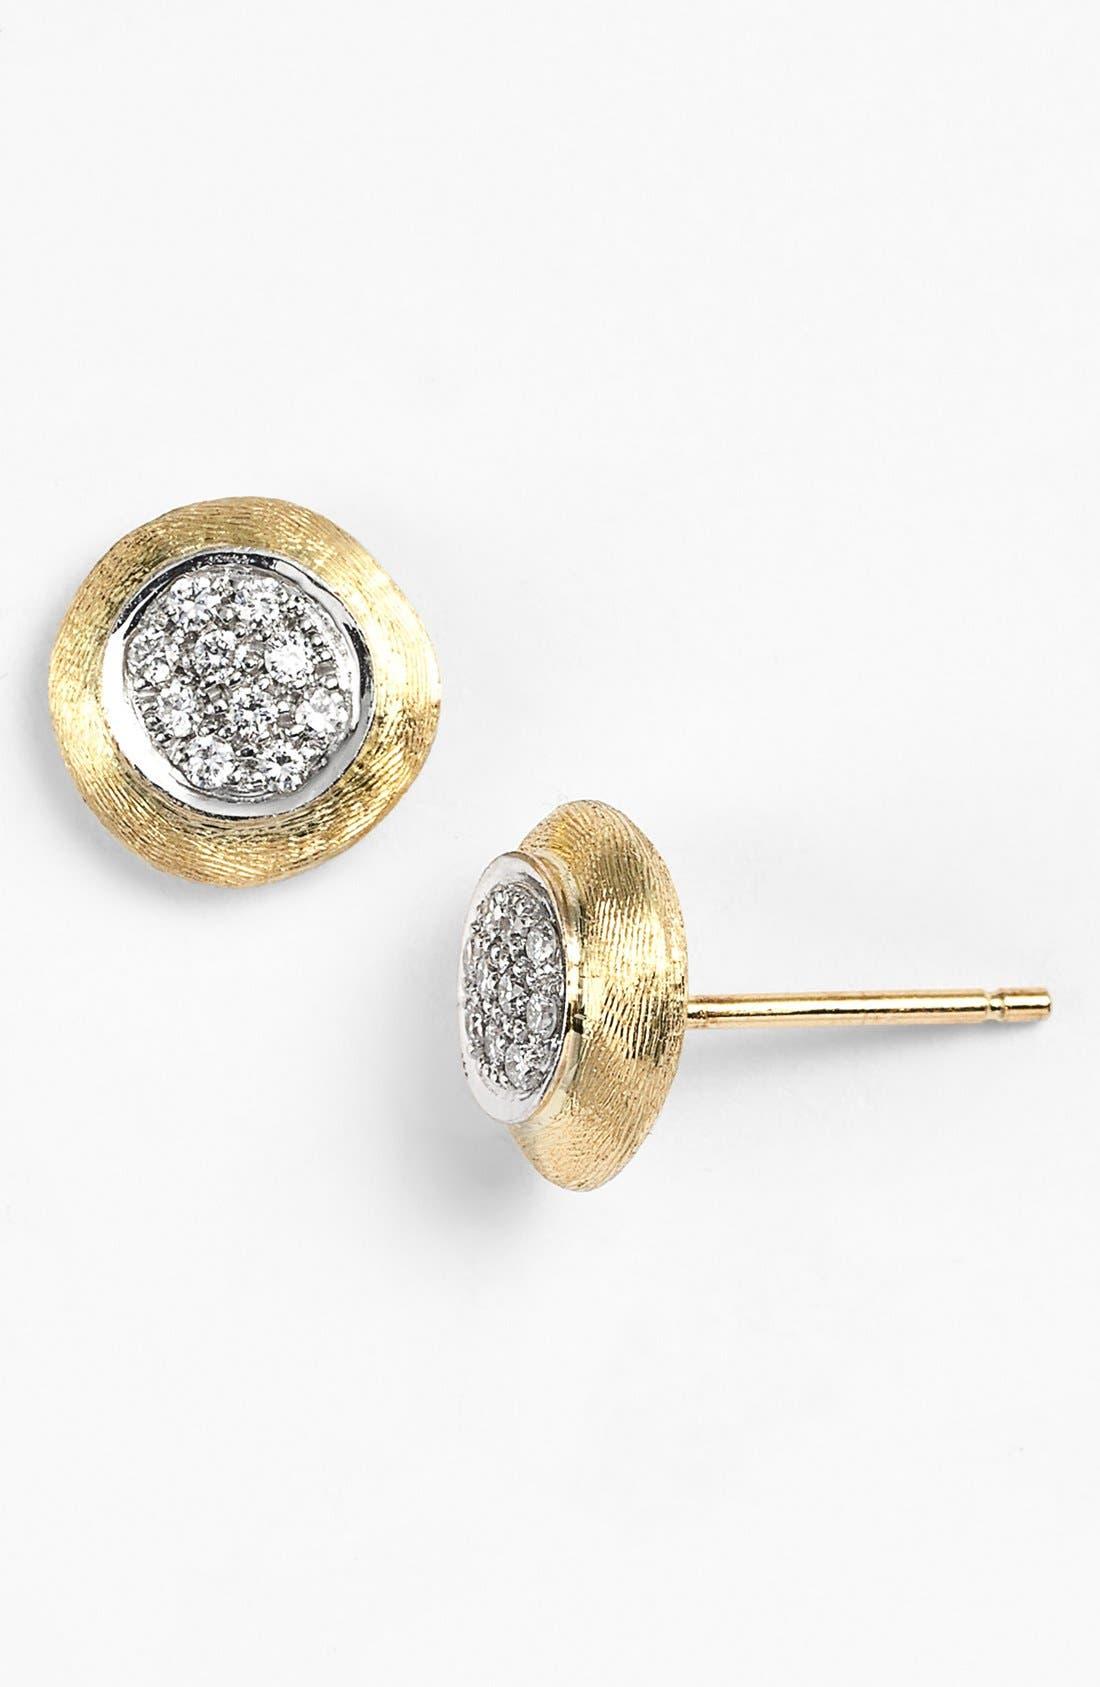 Main Image - Marco Bicego 'Delicate' Diamond Stud Earrings